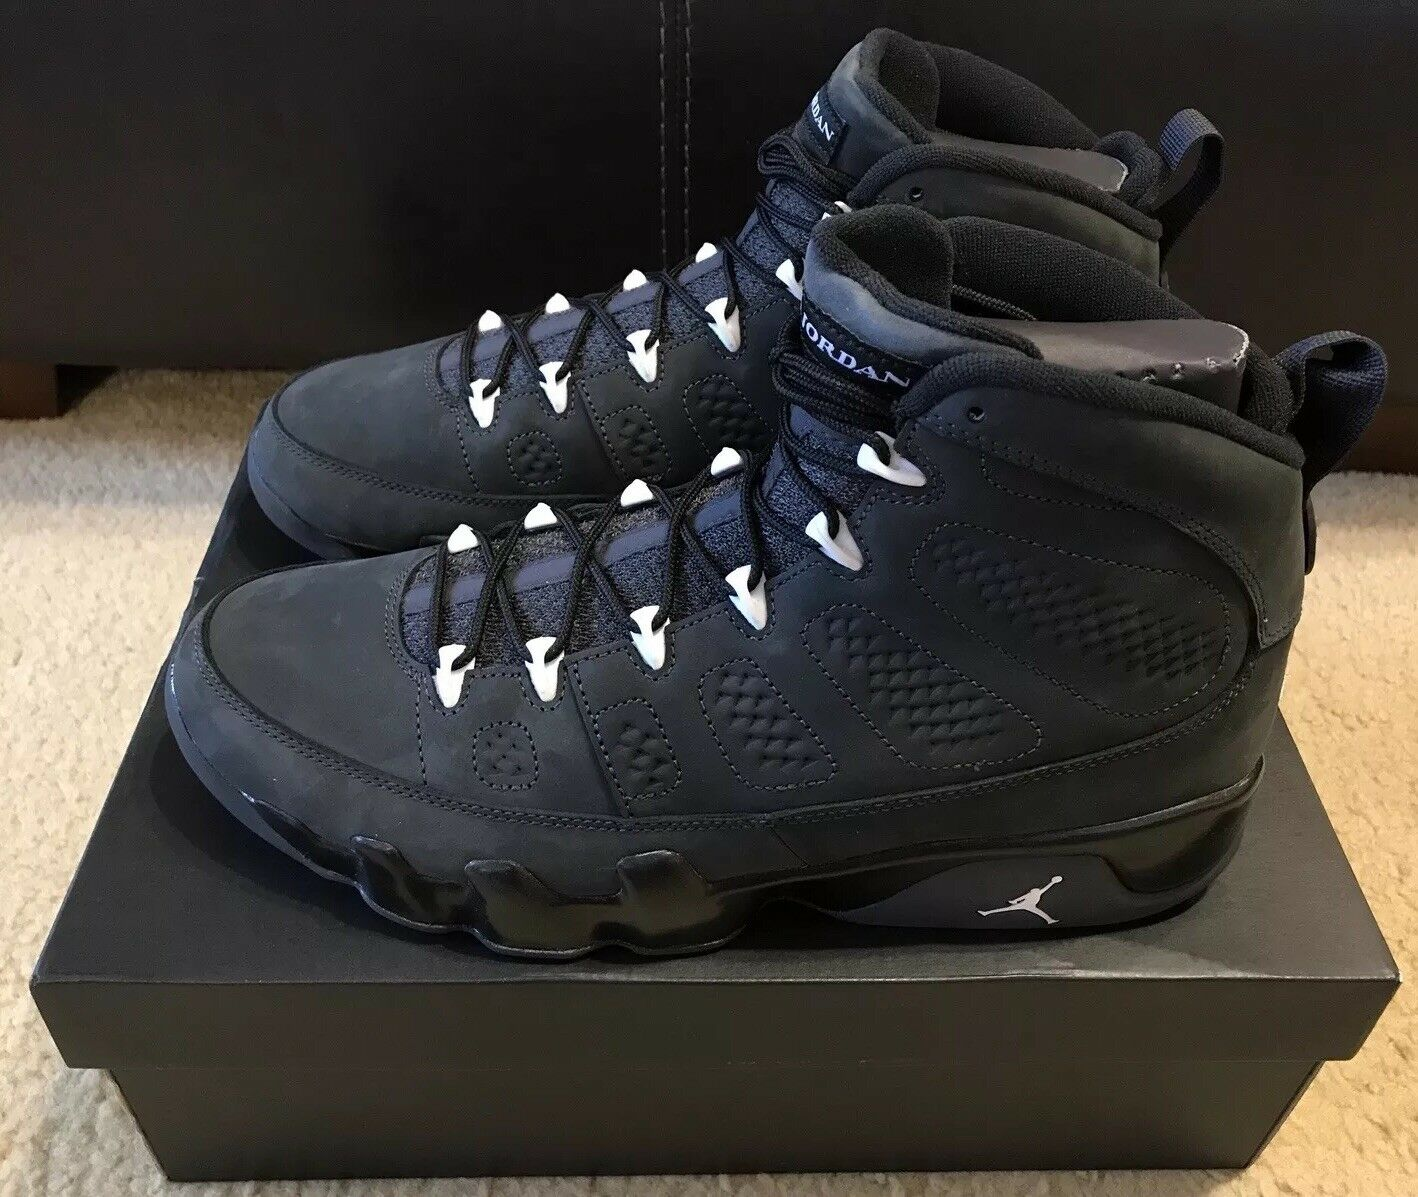 Nike Air Jordan 9 IX Retro Uomo Uomo Uomo sz 12 Anthracite bianca nero 302370 013 NIB DS 7bc4c5